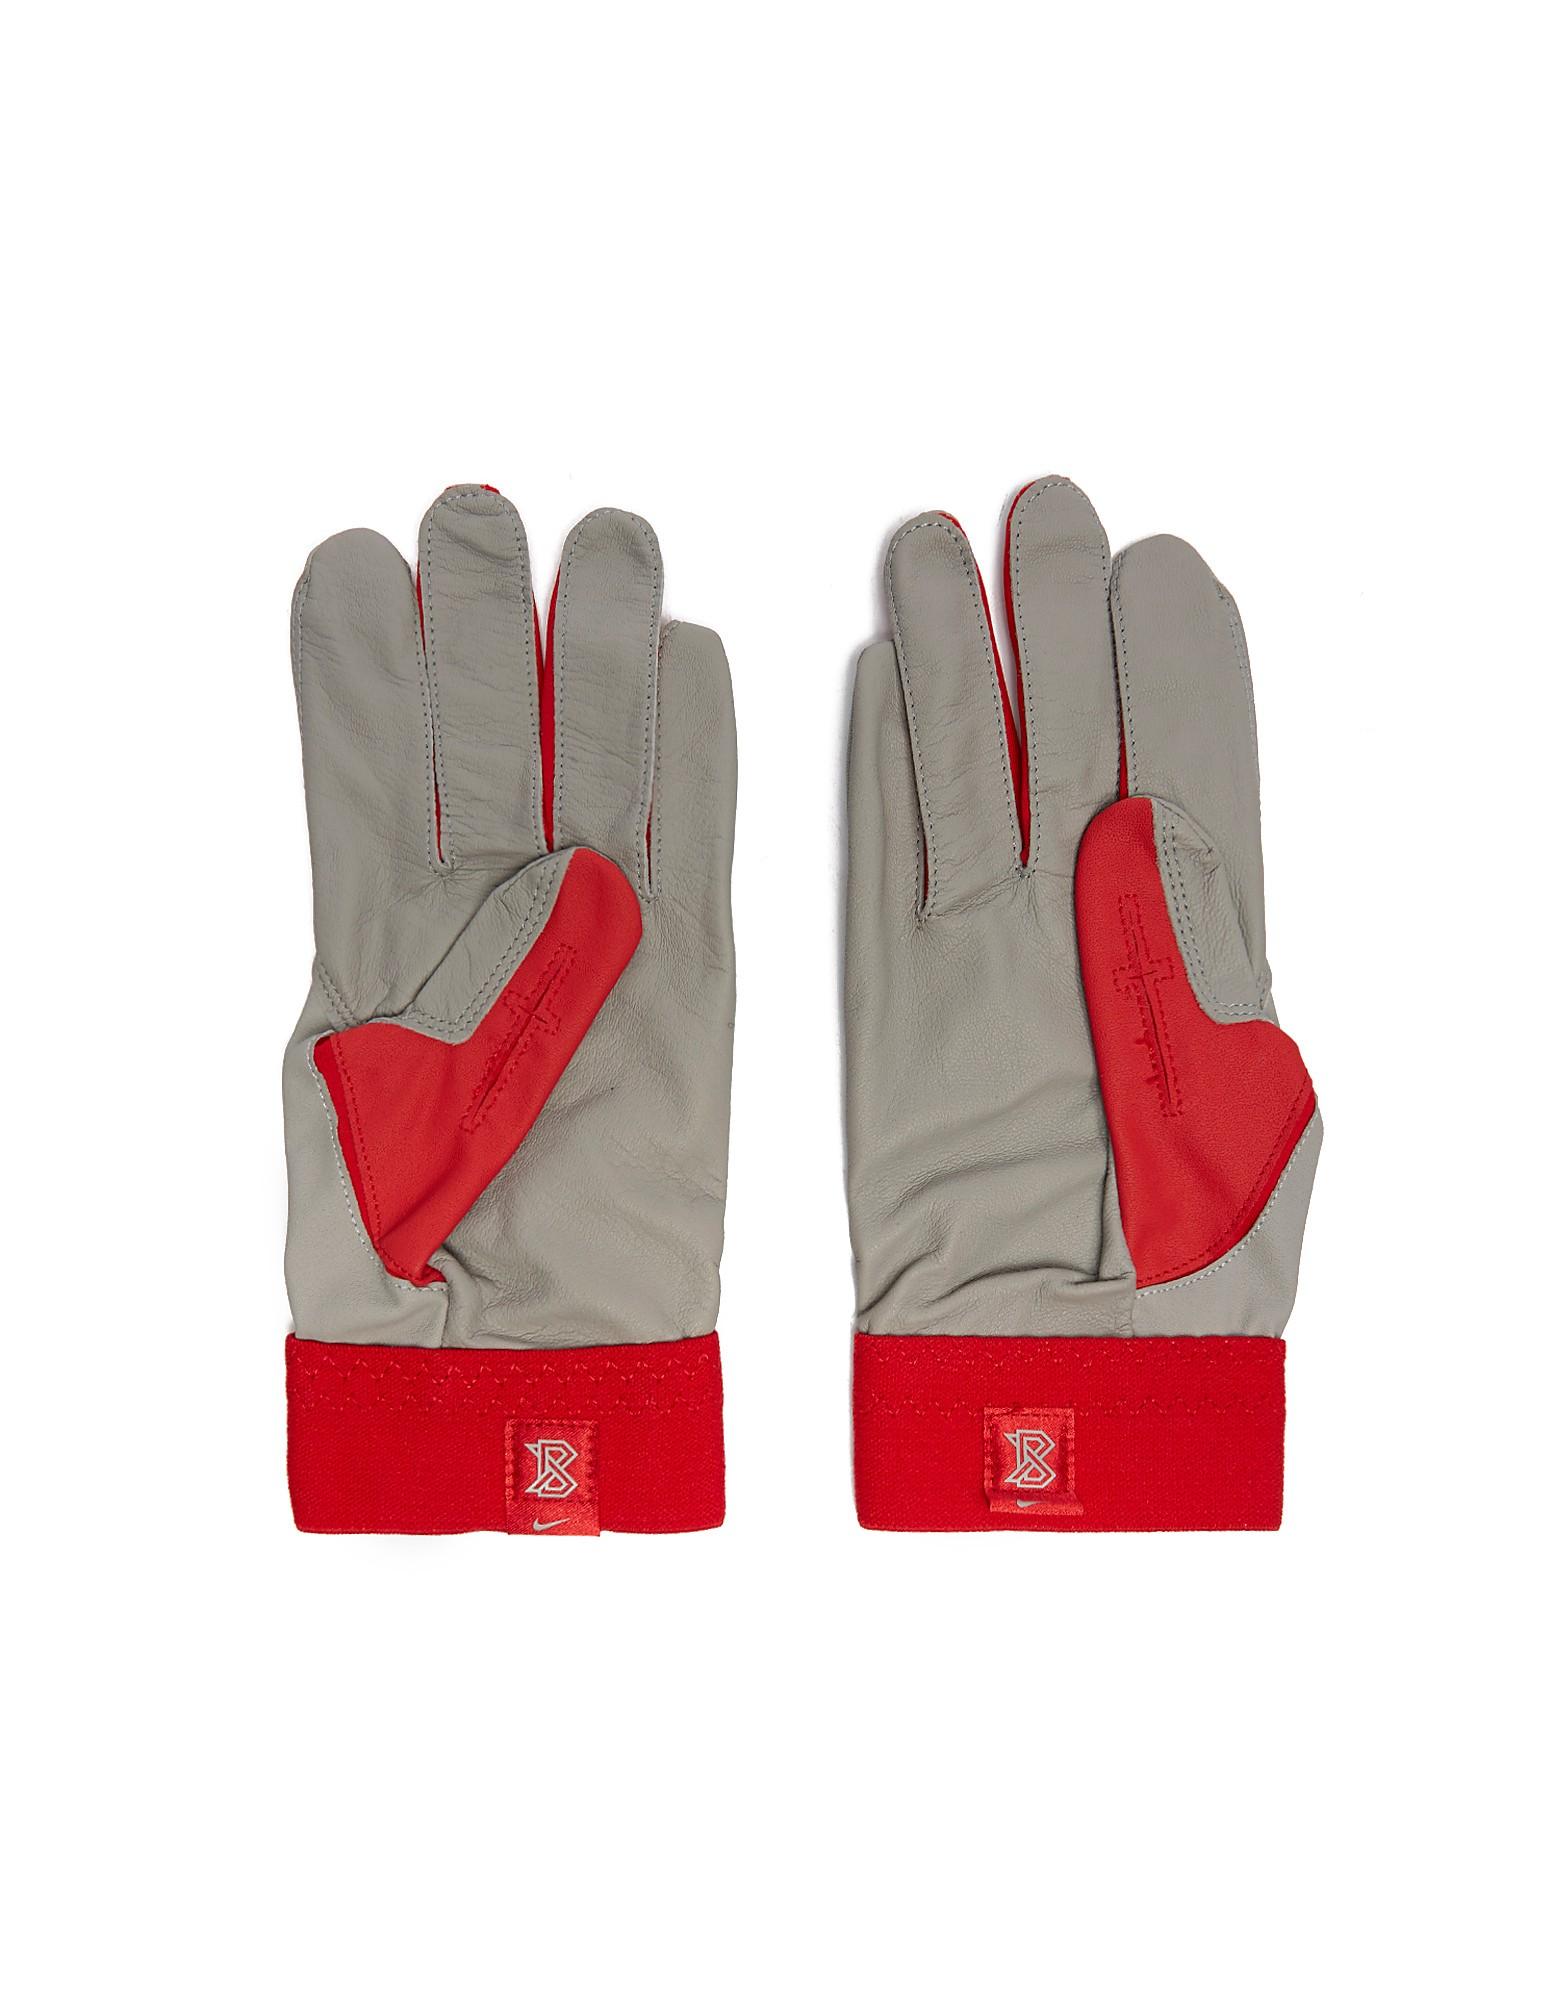 Nike Diamond Elite Batting Gloves